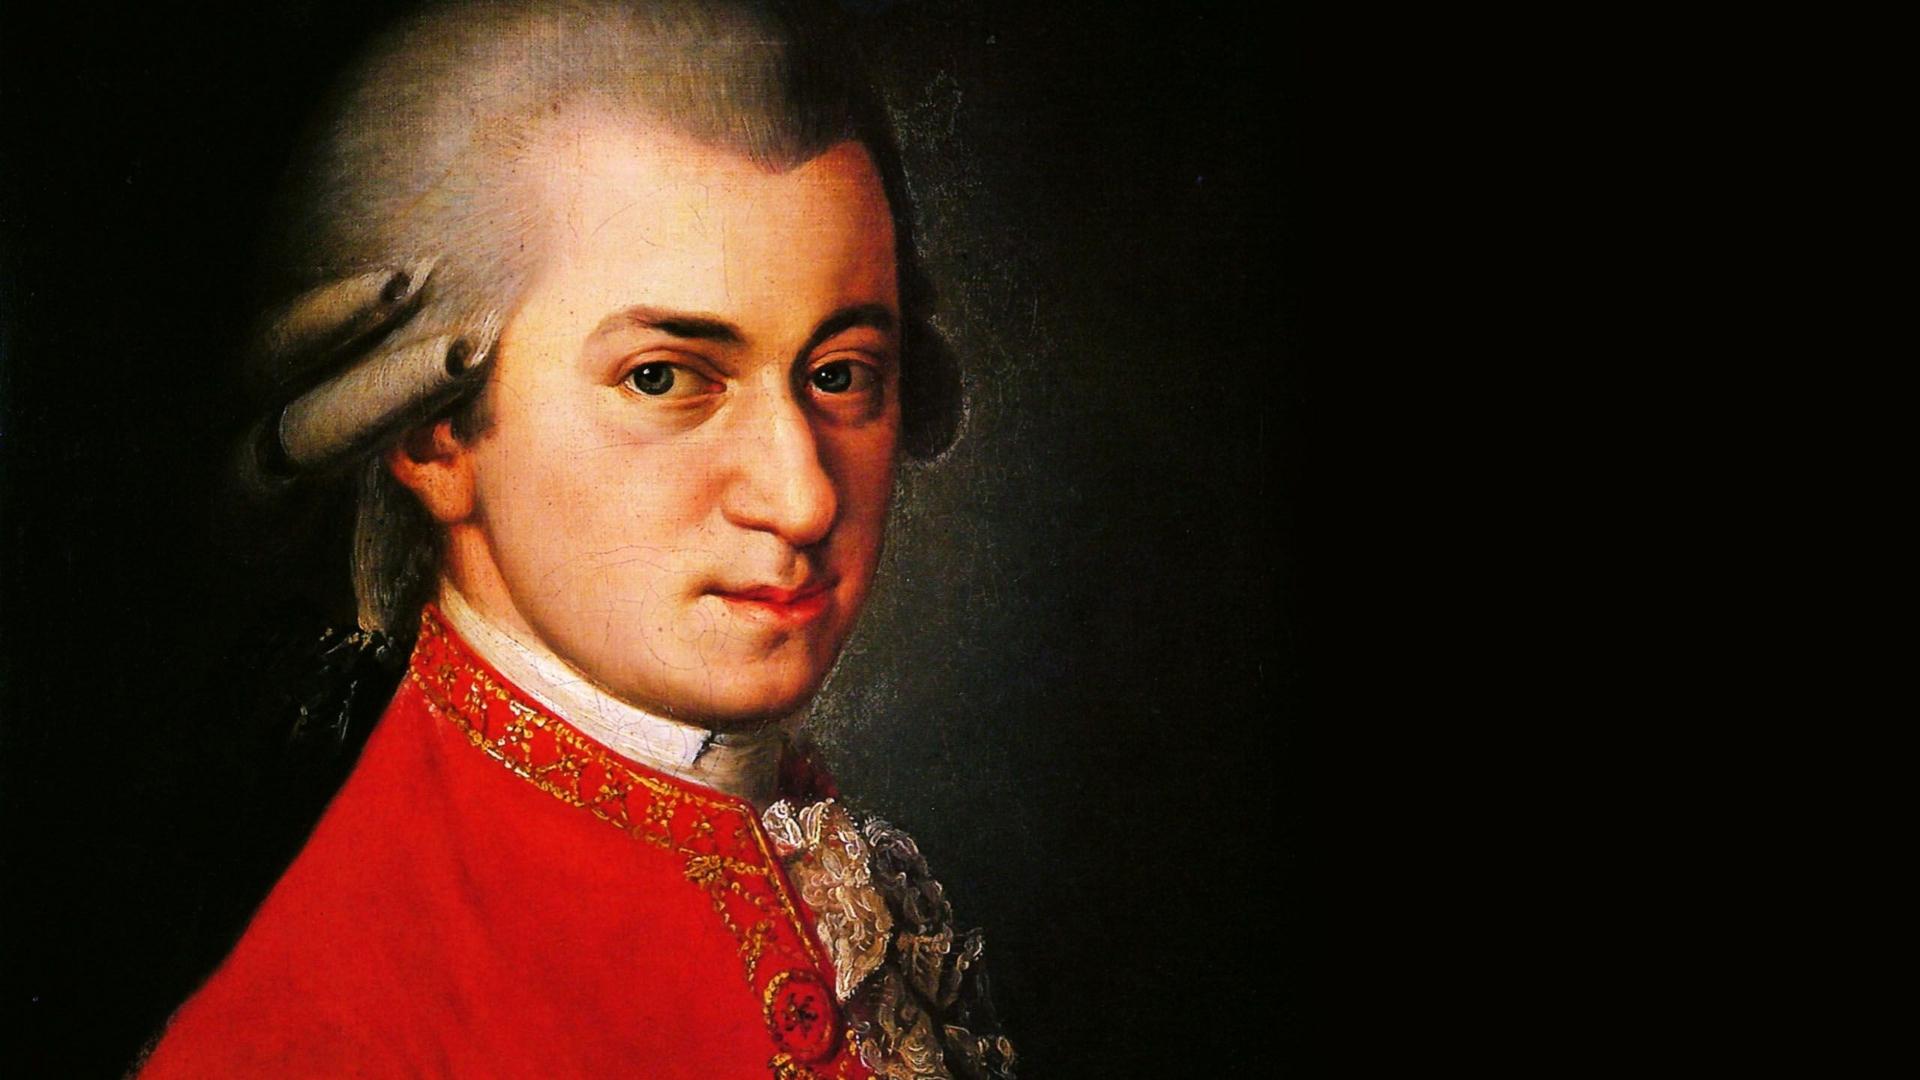 Symfoni Nr 40 G Moll av Wolfgang Amadeus Mozart